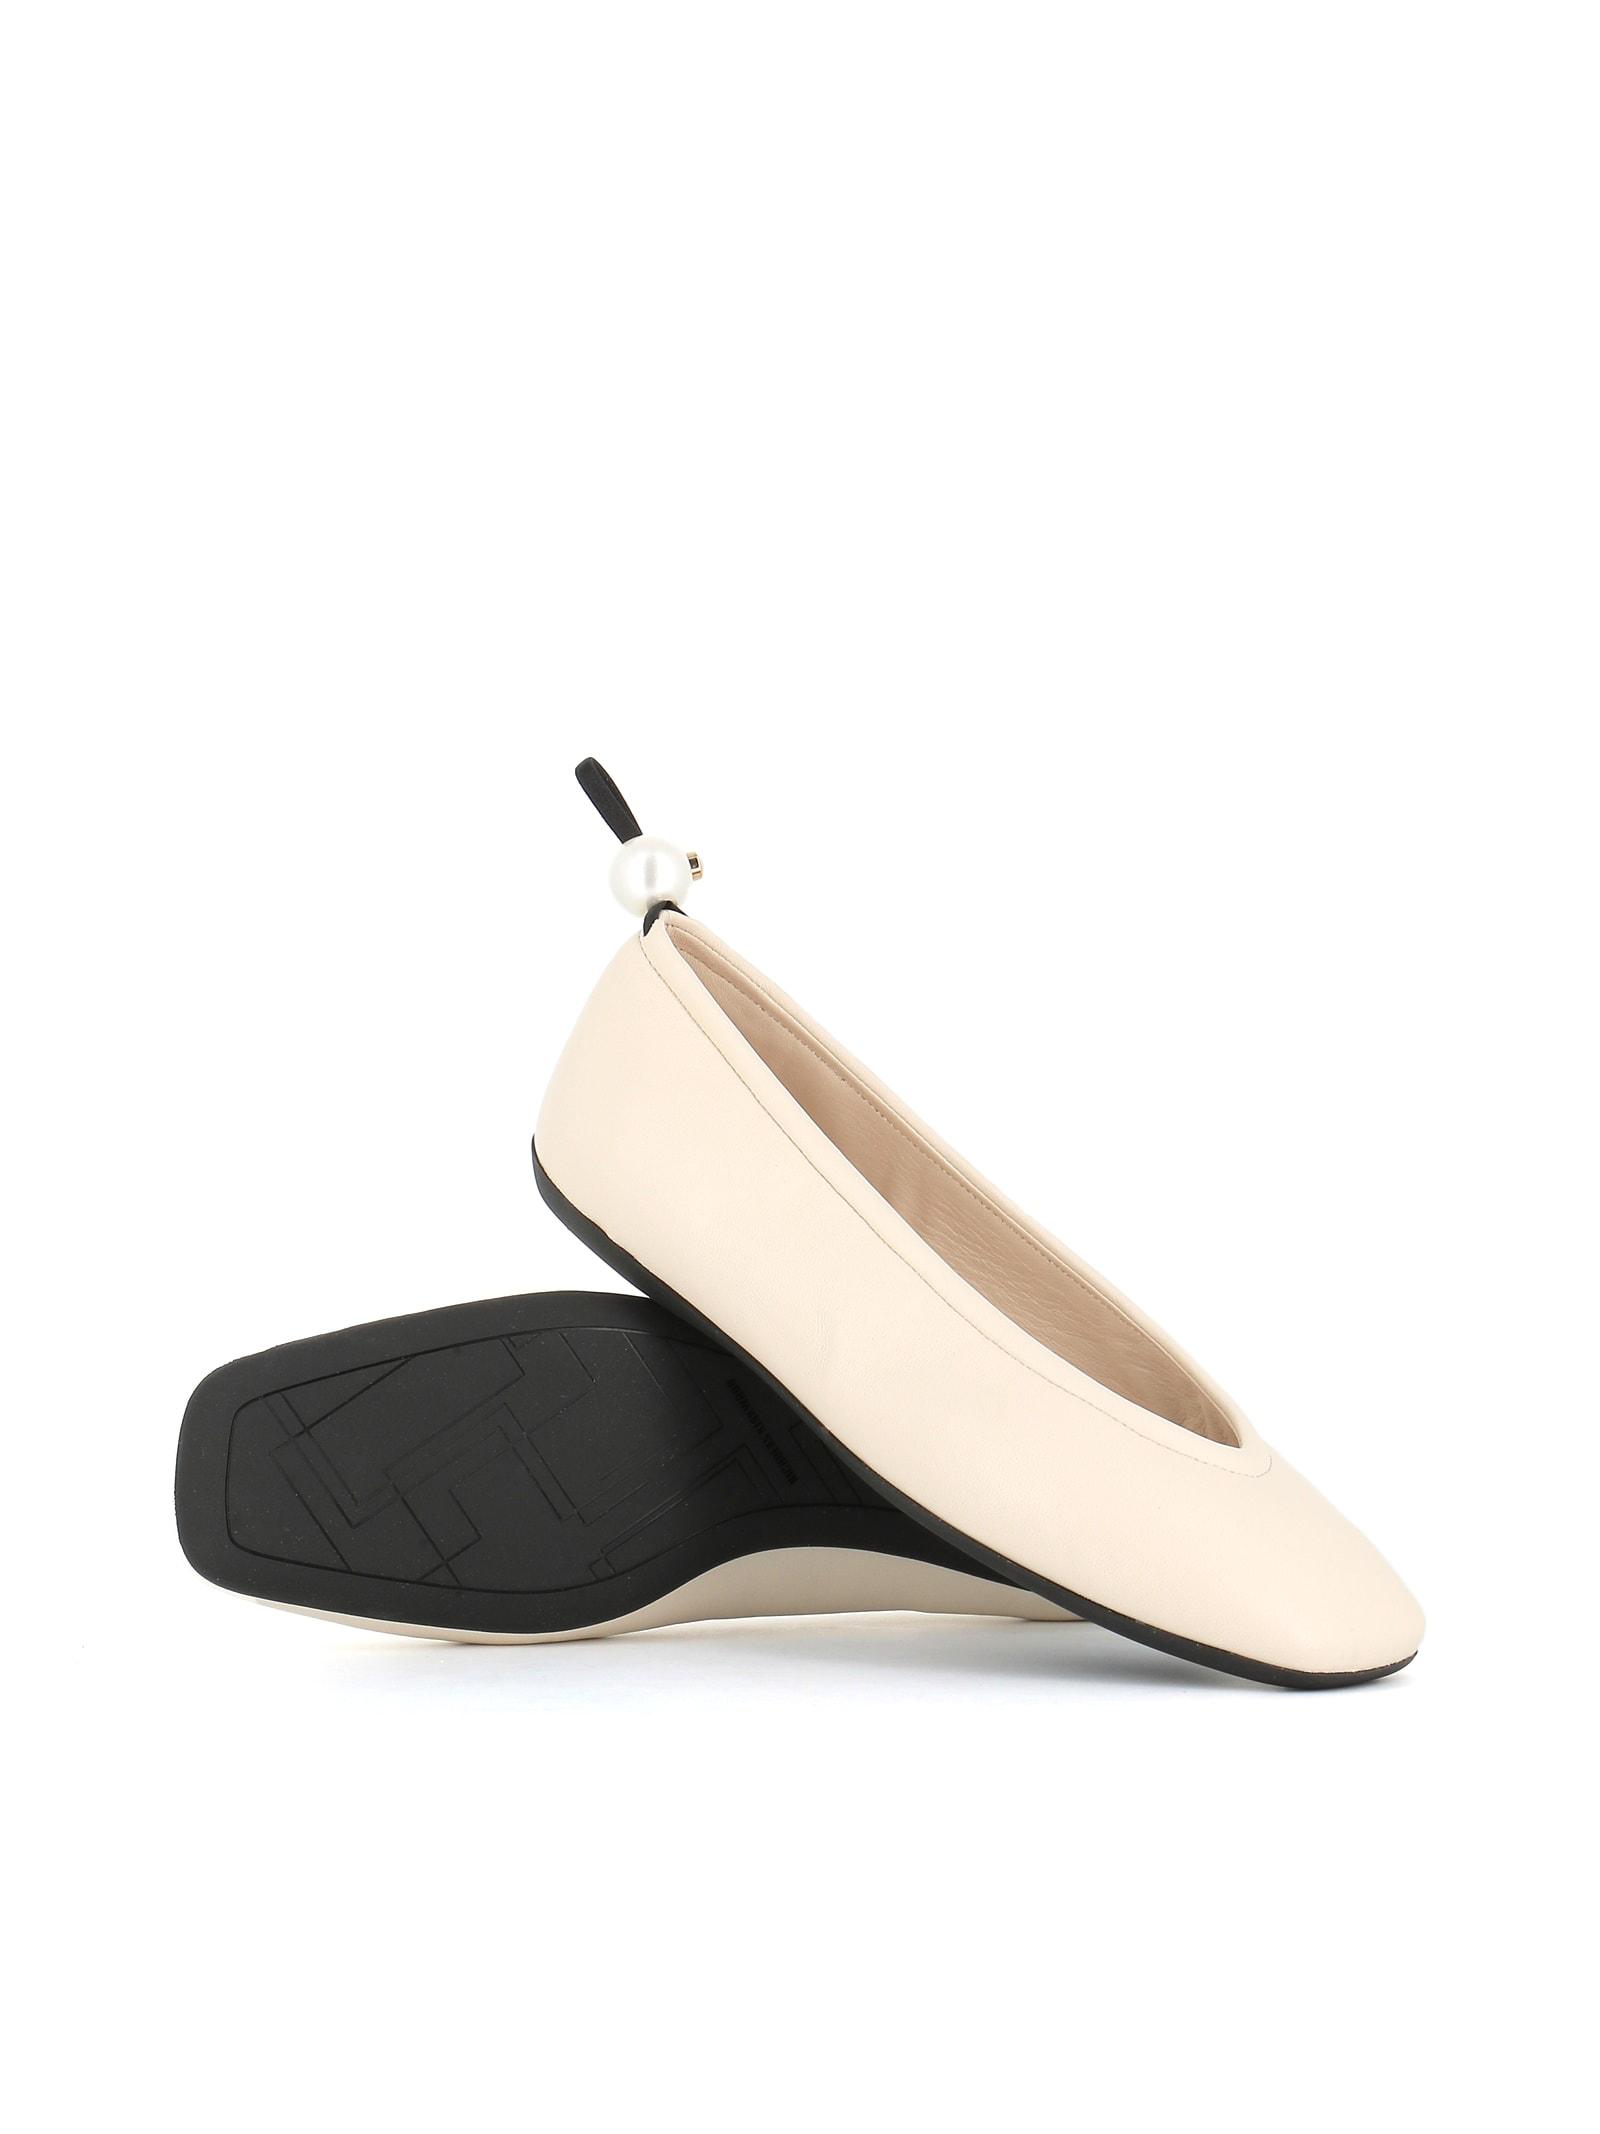 Buy Nicholas Kirkwood Ballerina Delfi online, shop Nicholas Kirkwood shoes with free shipping